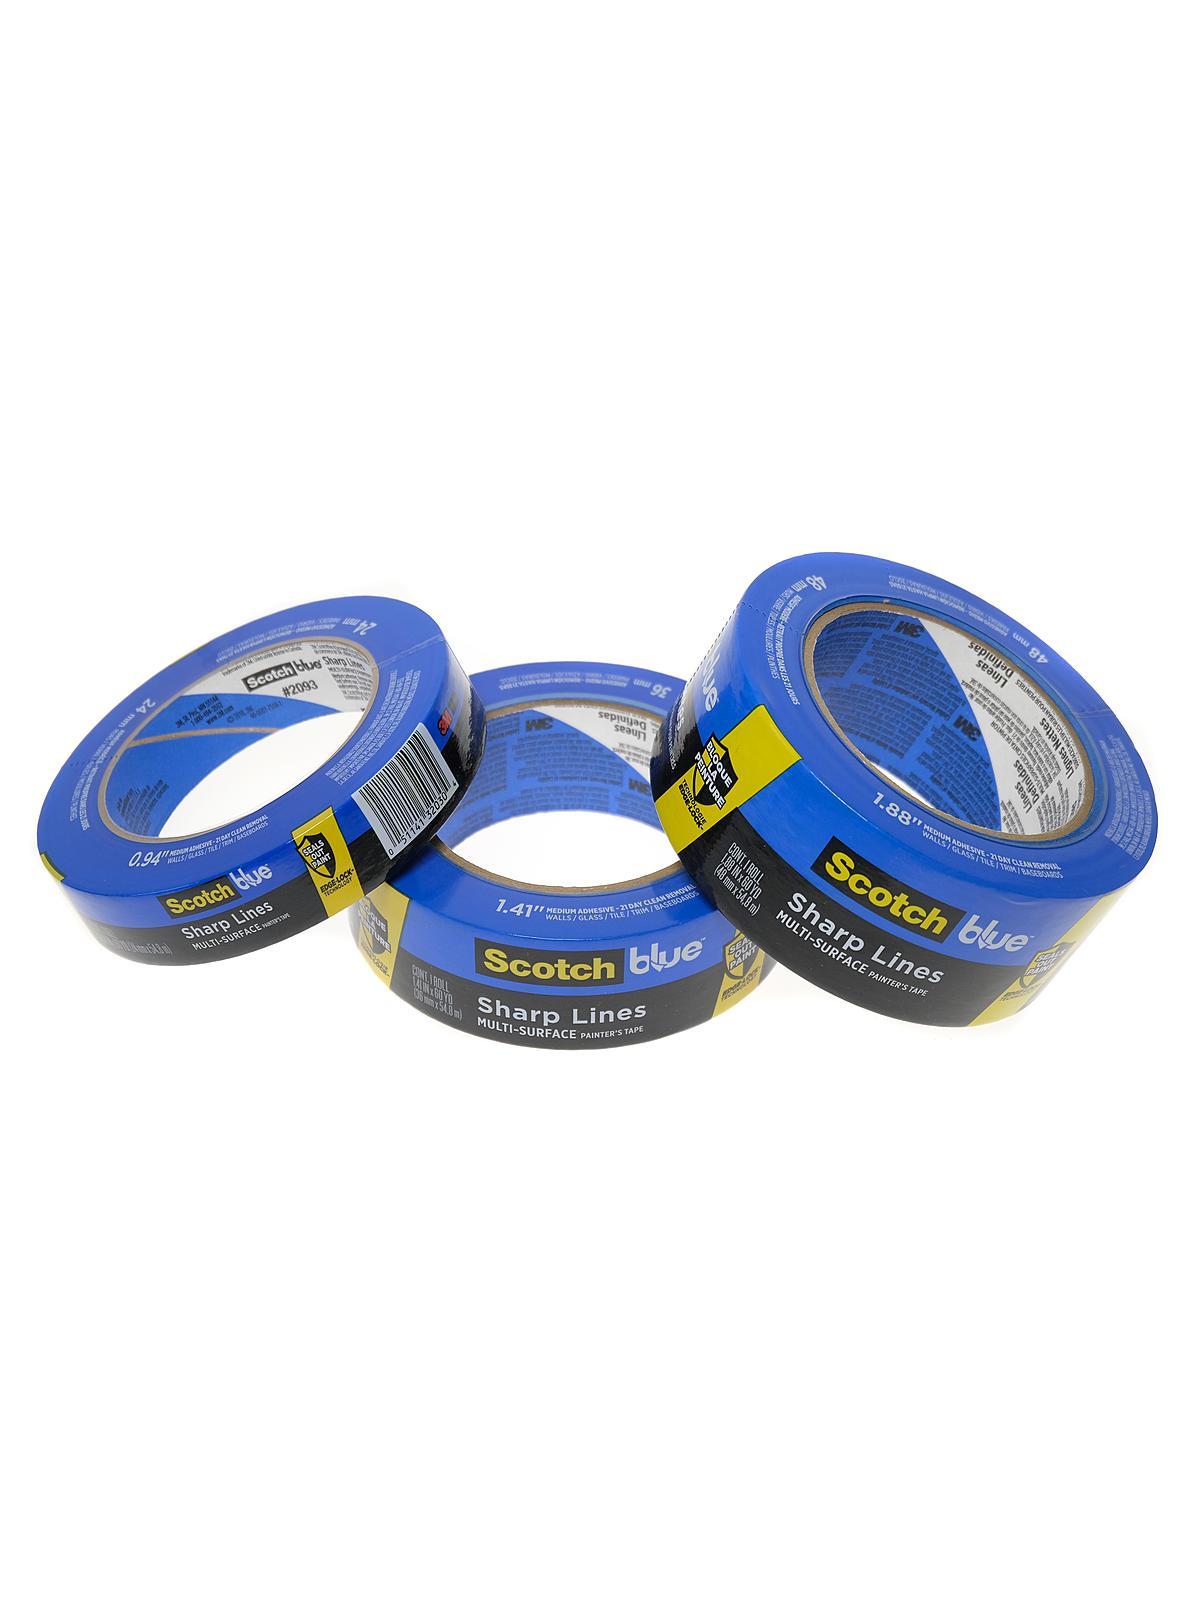 Blue Sharp Lines Painter's Tape